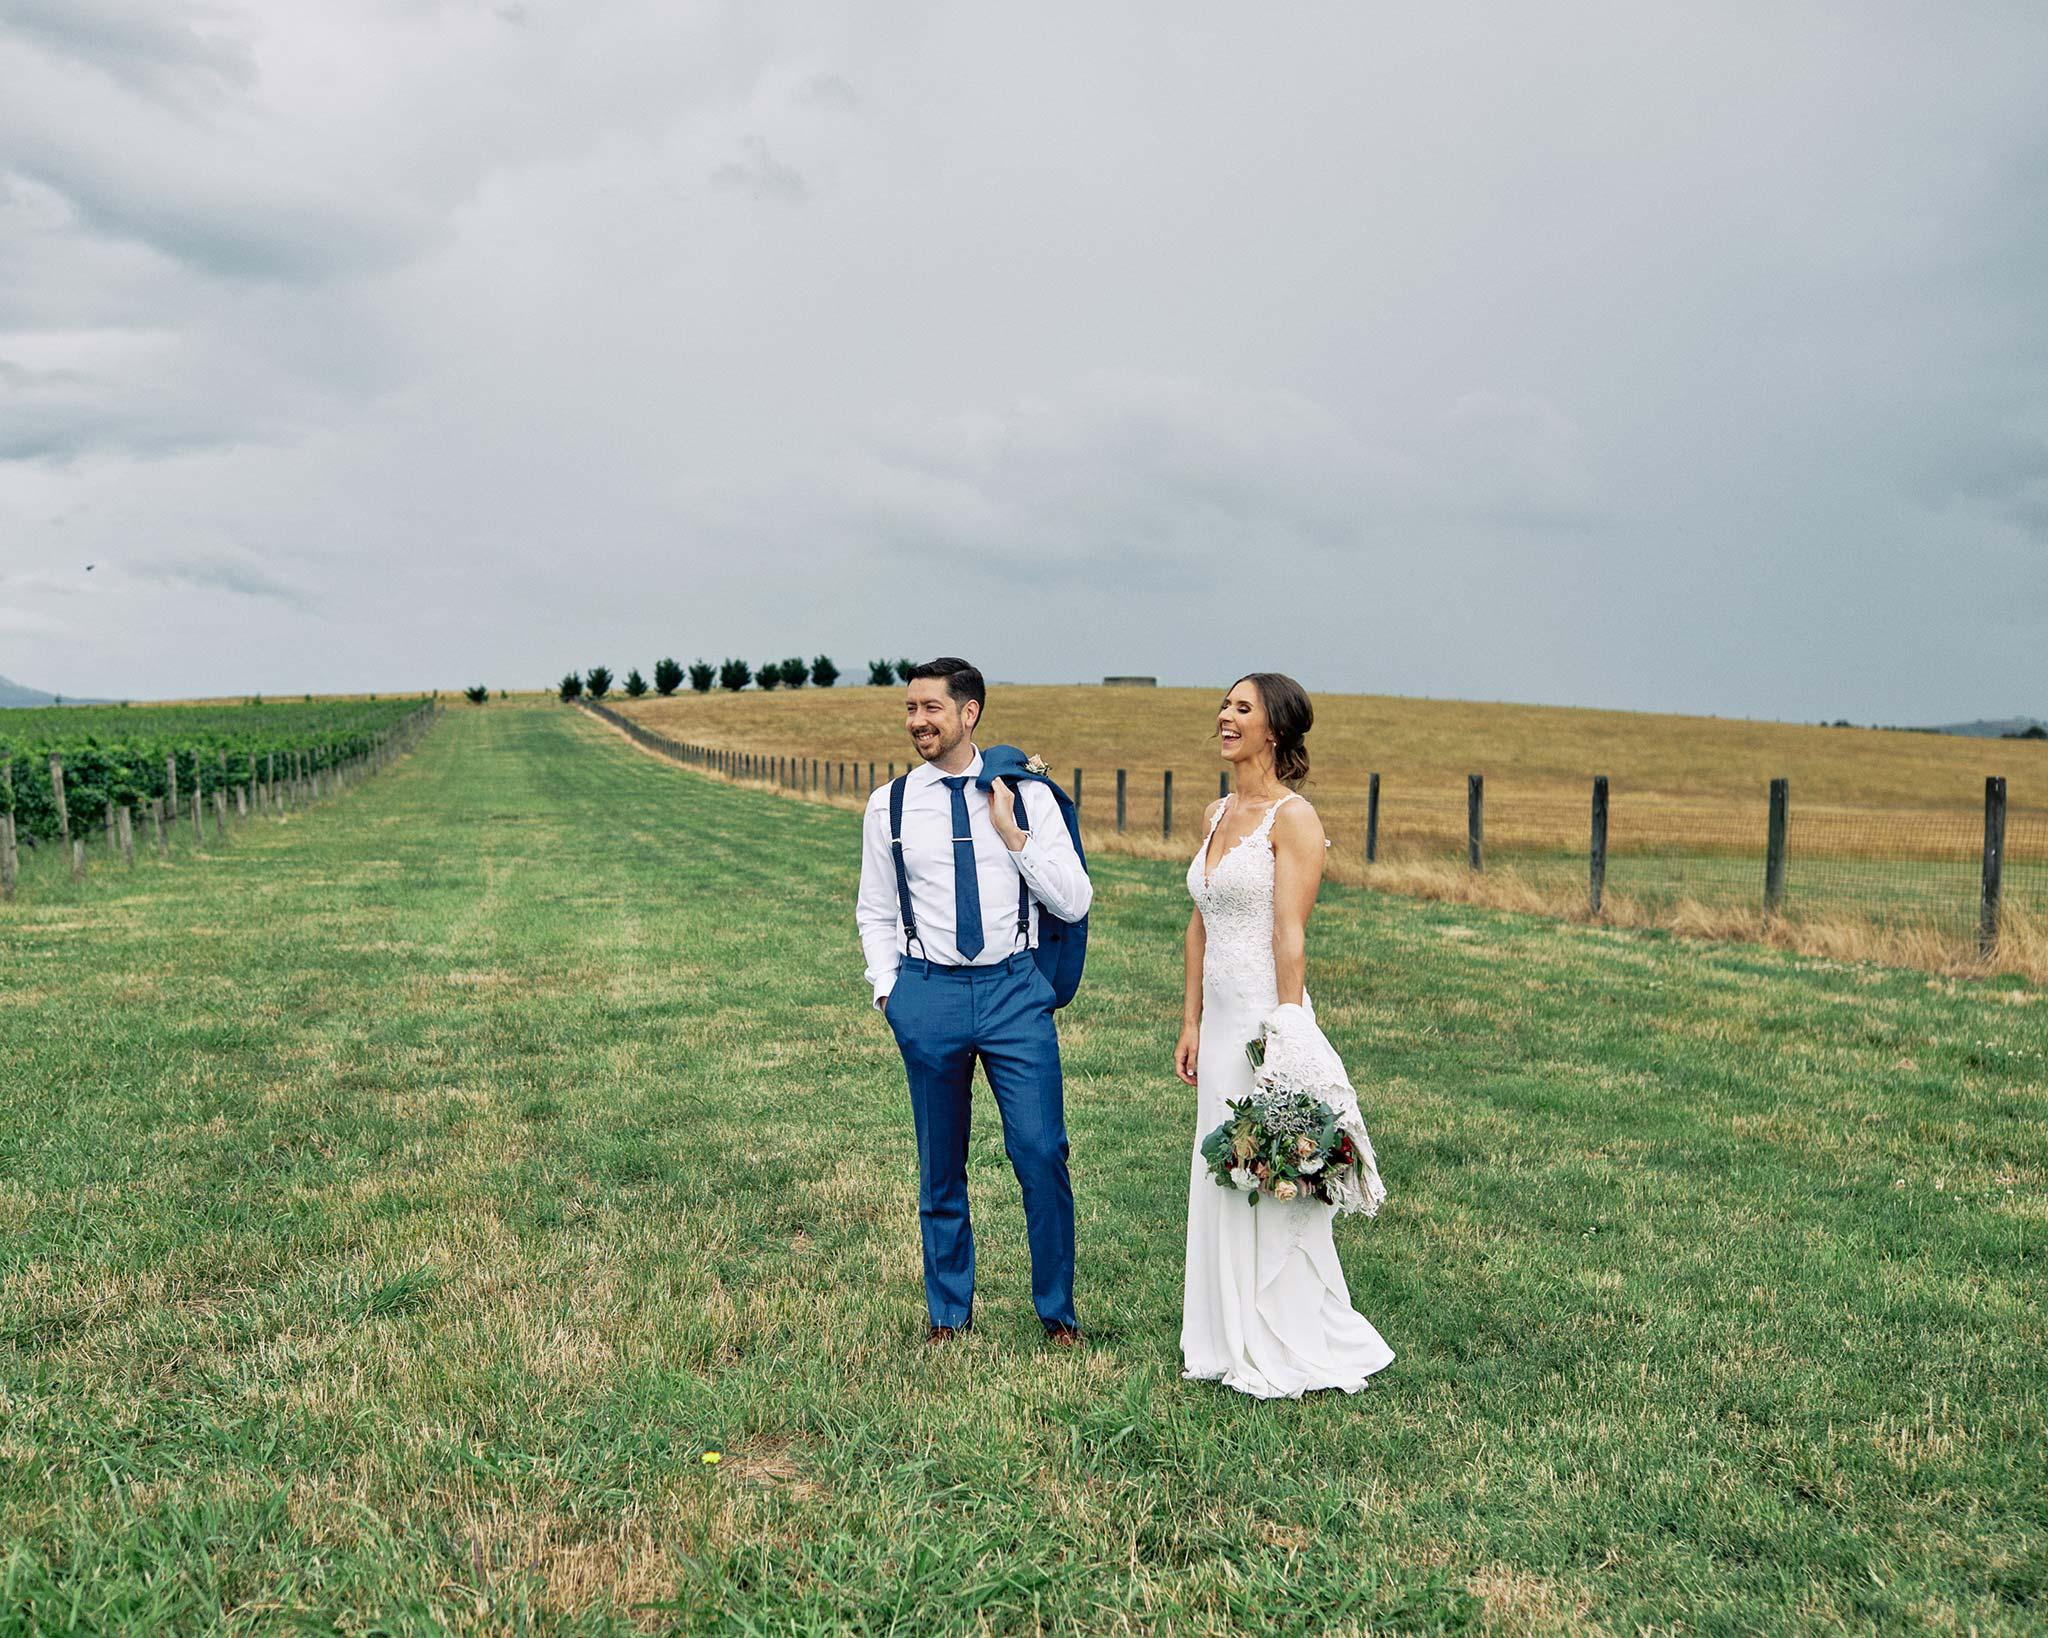 Zonzo estate wedding casual vineyard